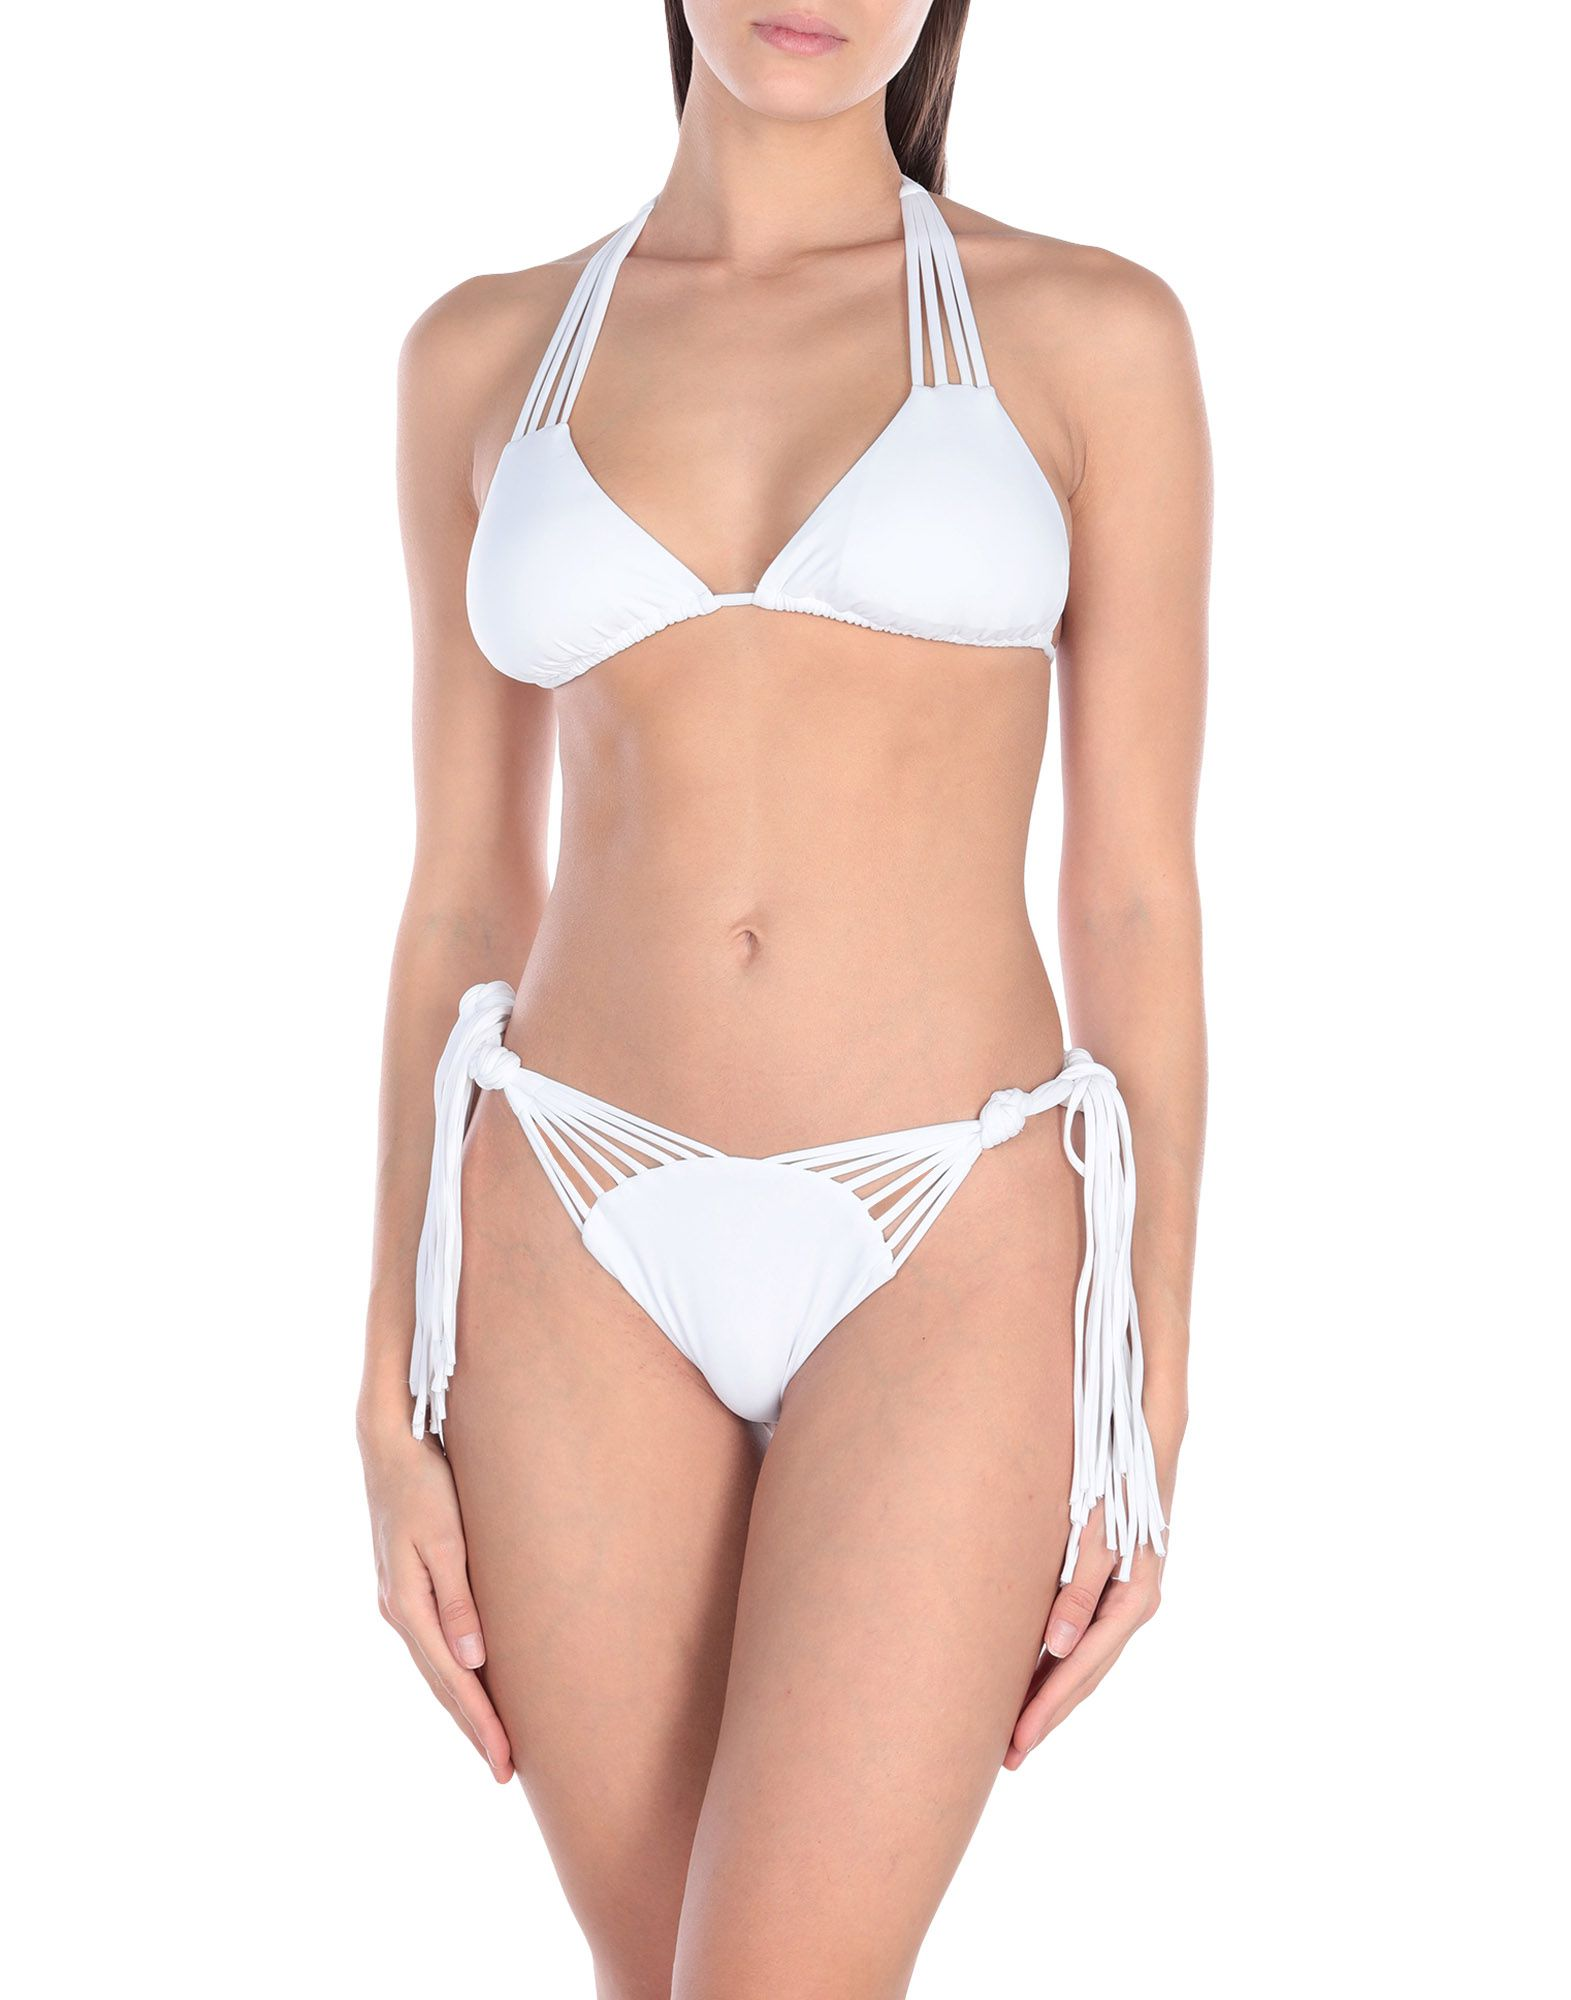 MISS BIKINI LUXE Бикини bikini machine bikini machine let's party with bikini machine vol 2 lp